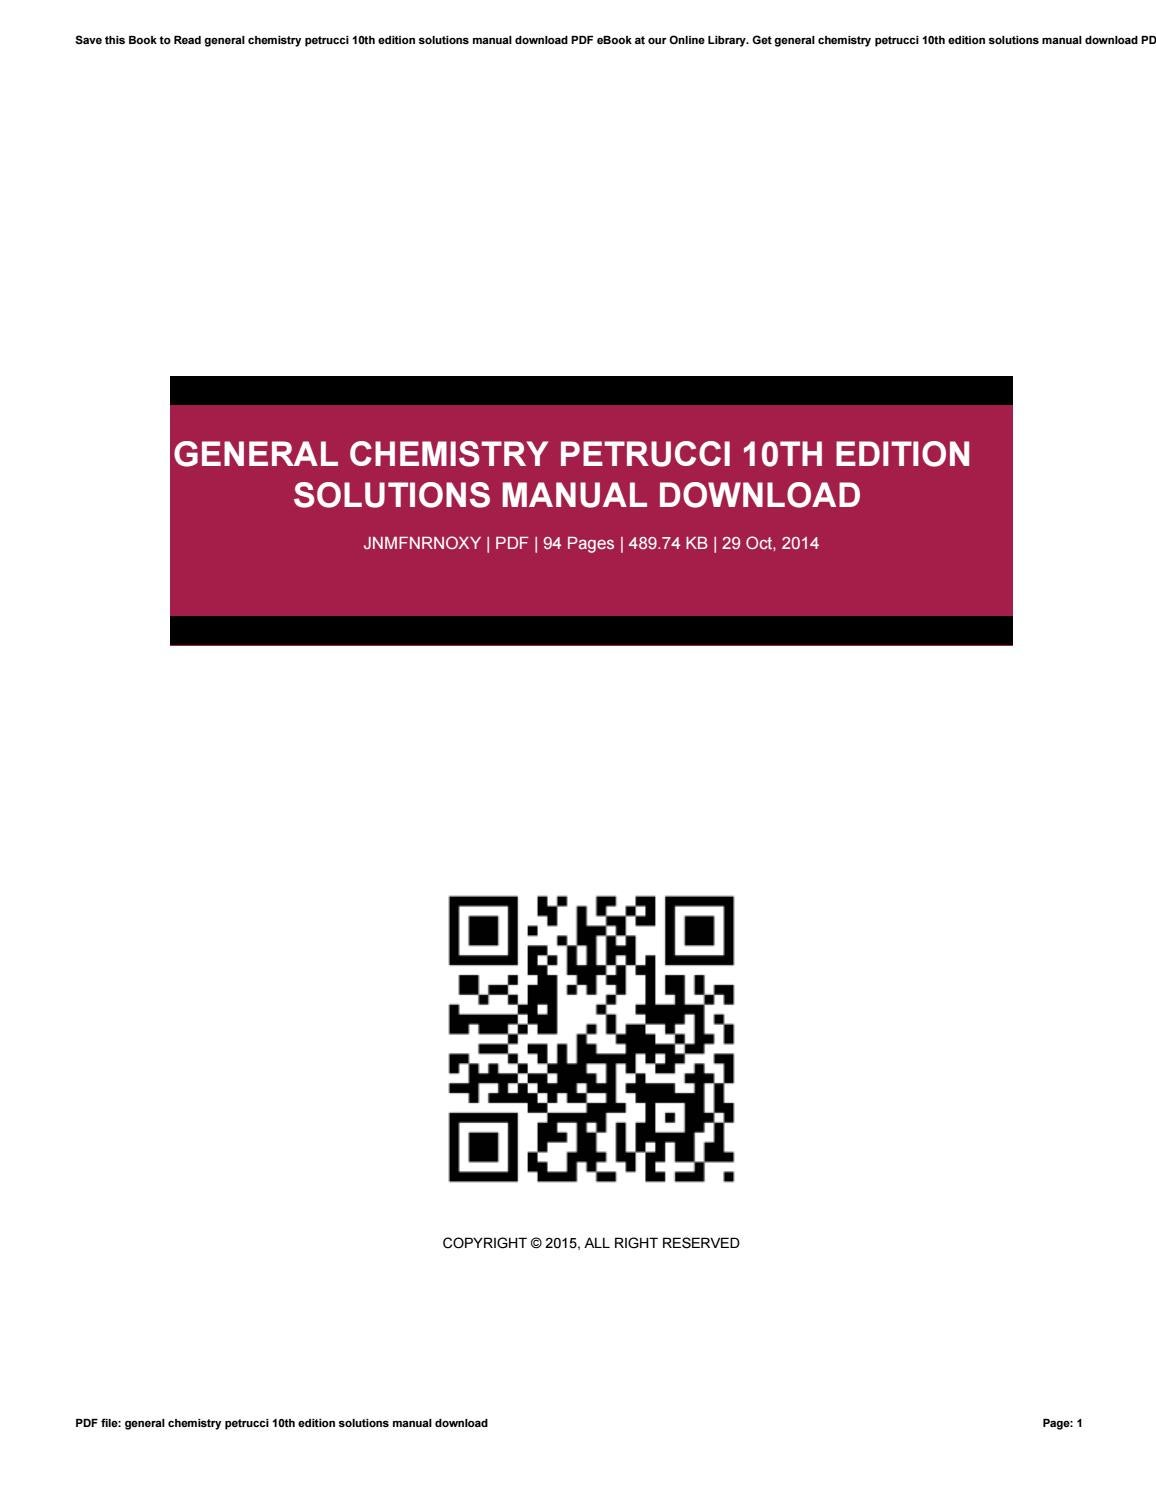 General chemistry petrucci 10th edition solutions manual download by  MillardCarlton4903 - issuu